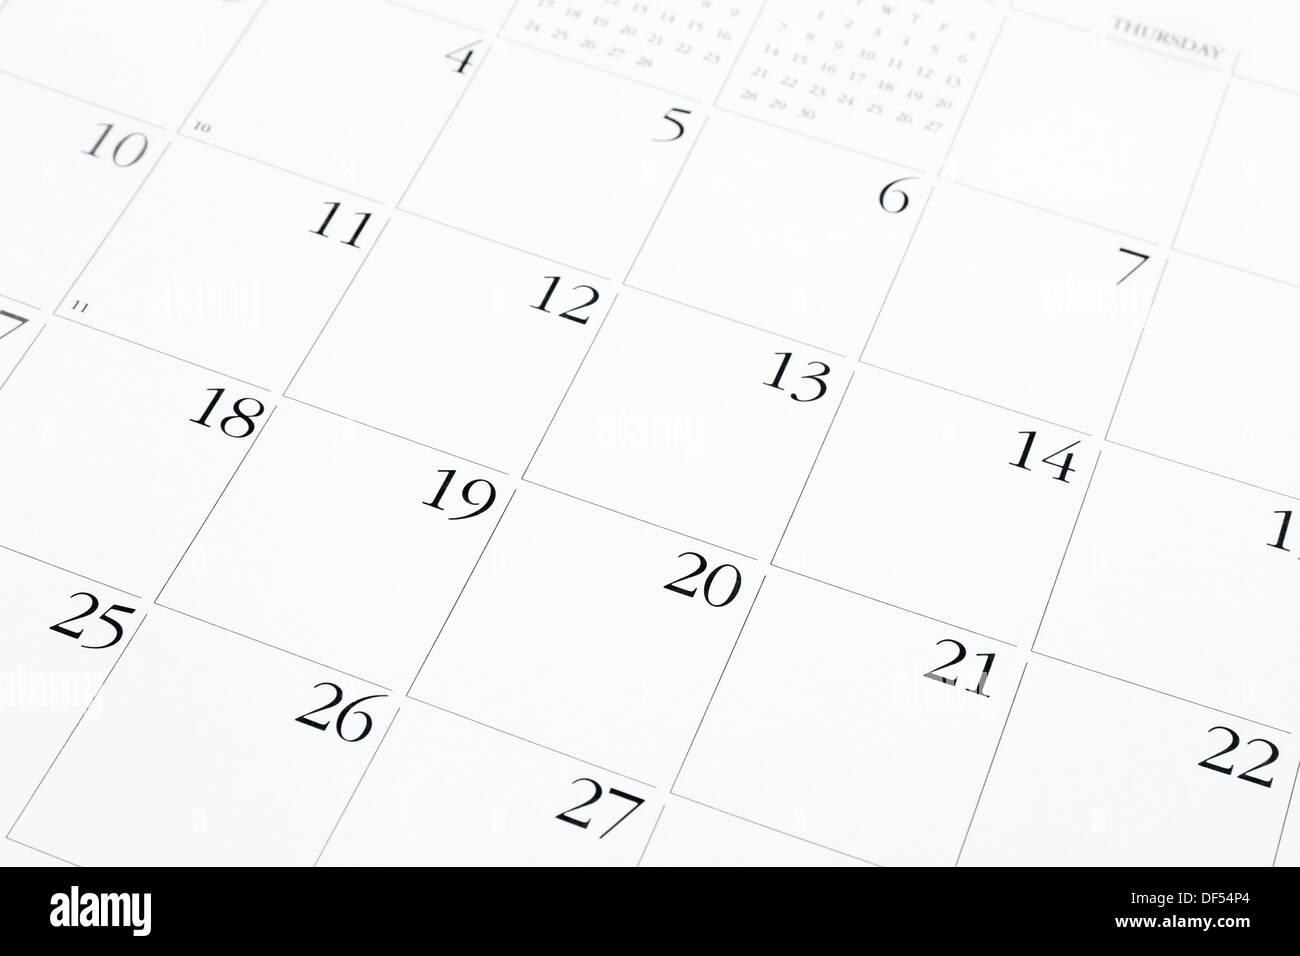 Closeup of dates on calendar page - Stock Image